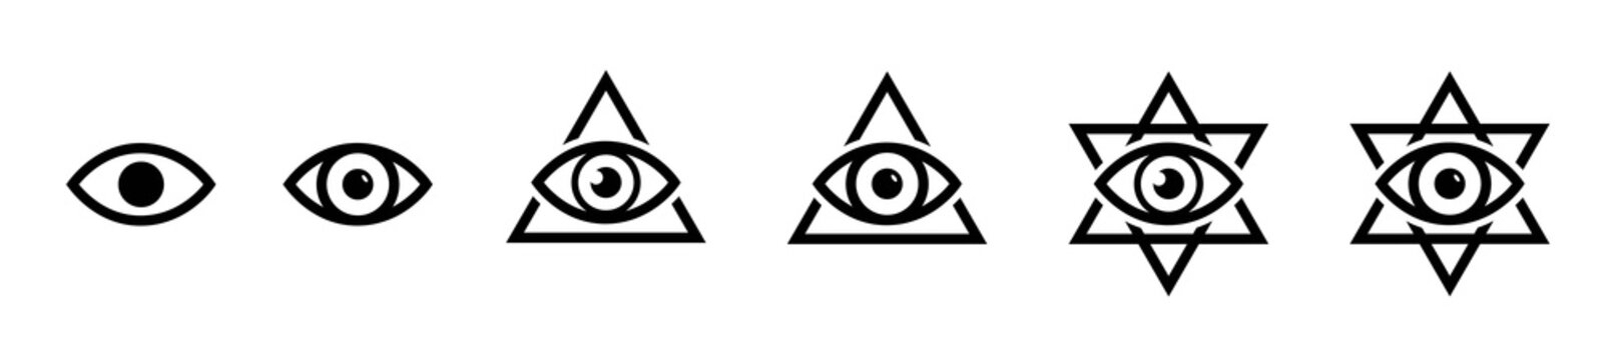 All seeing eye icon, illumination symbols, masonic sign, conspiracy of elites, the Jewish star sign of David